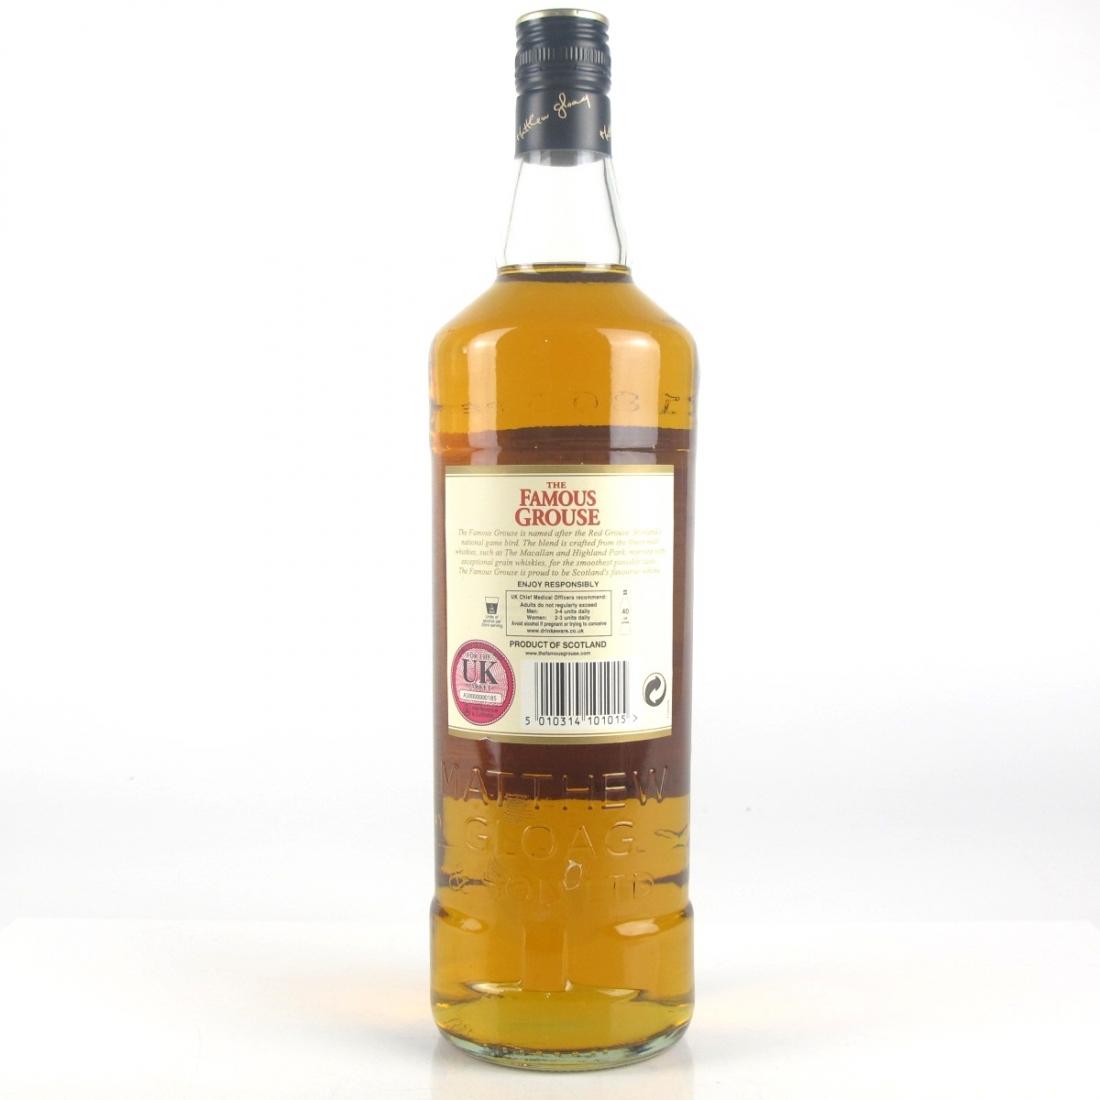 Famous Grouse Scotch Whisky 1 Litre